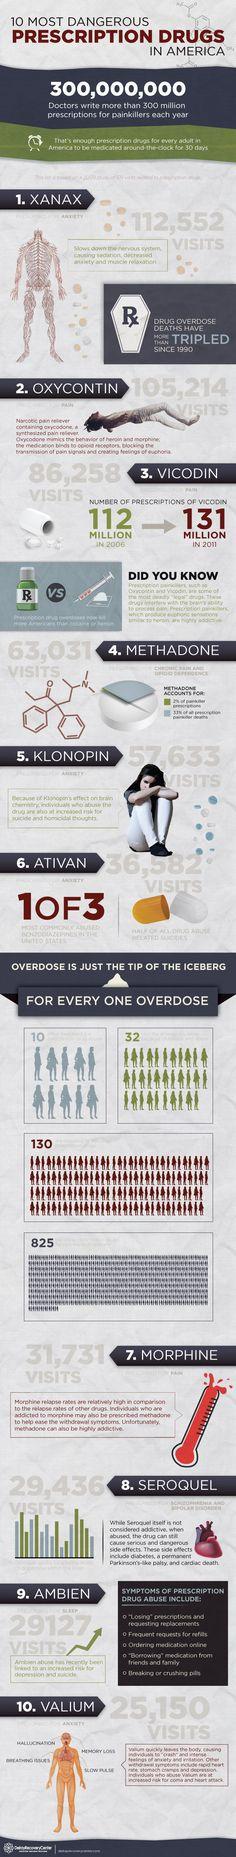 The top 10 most dangerous prescription drugs in America.